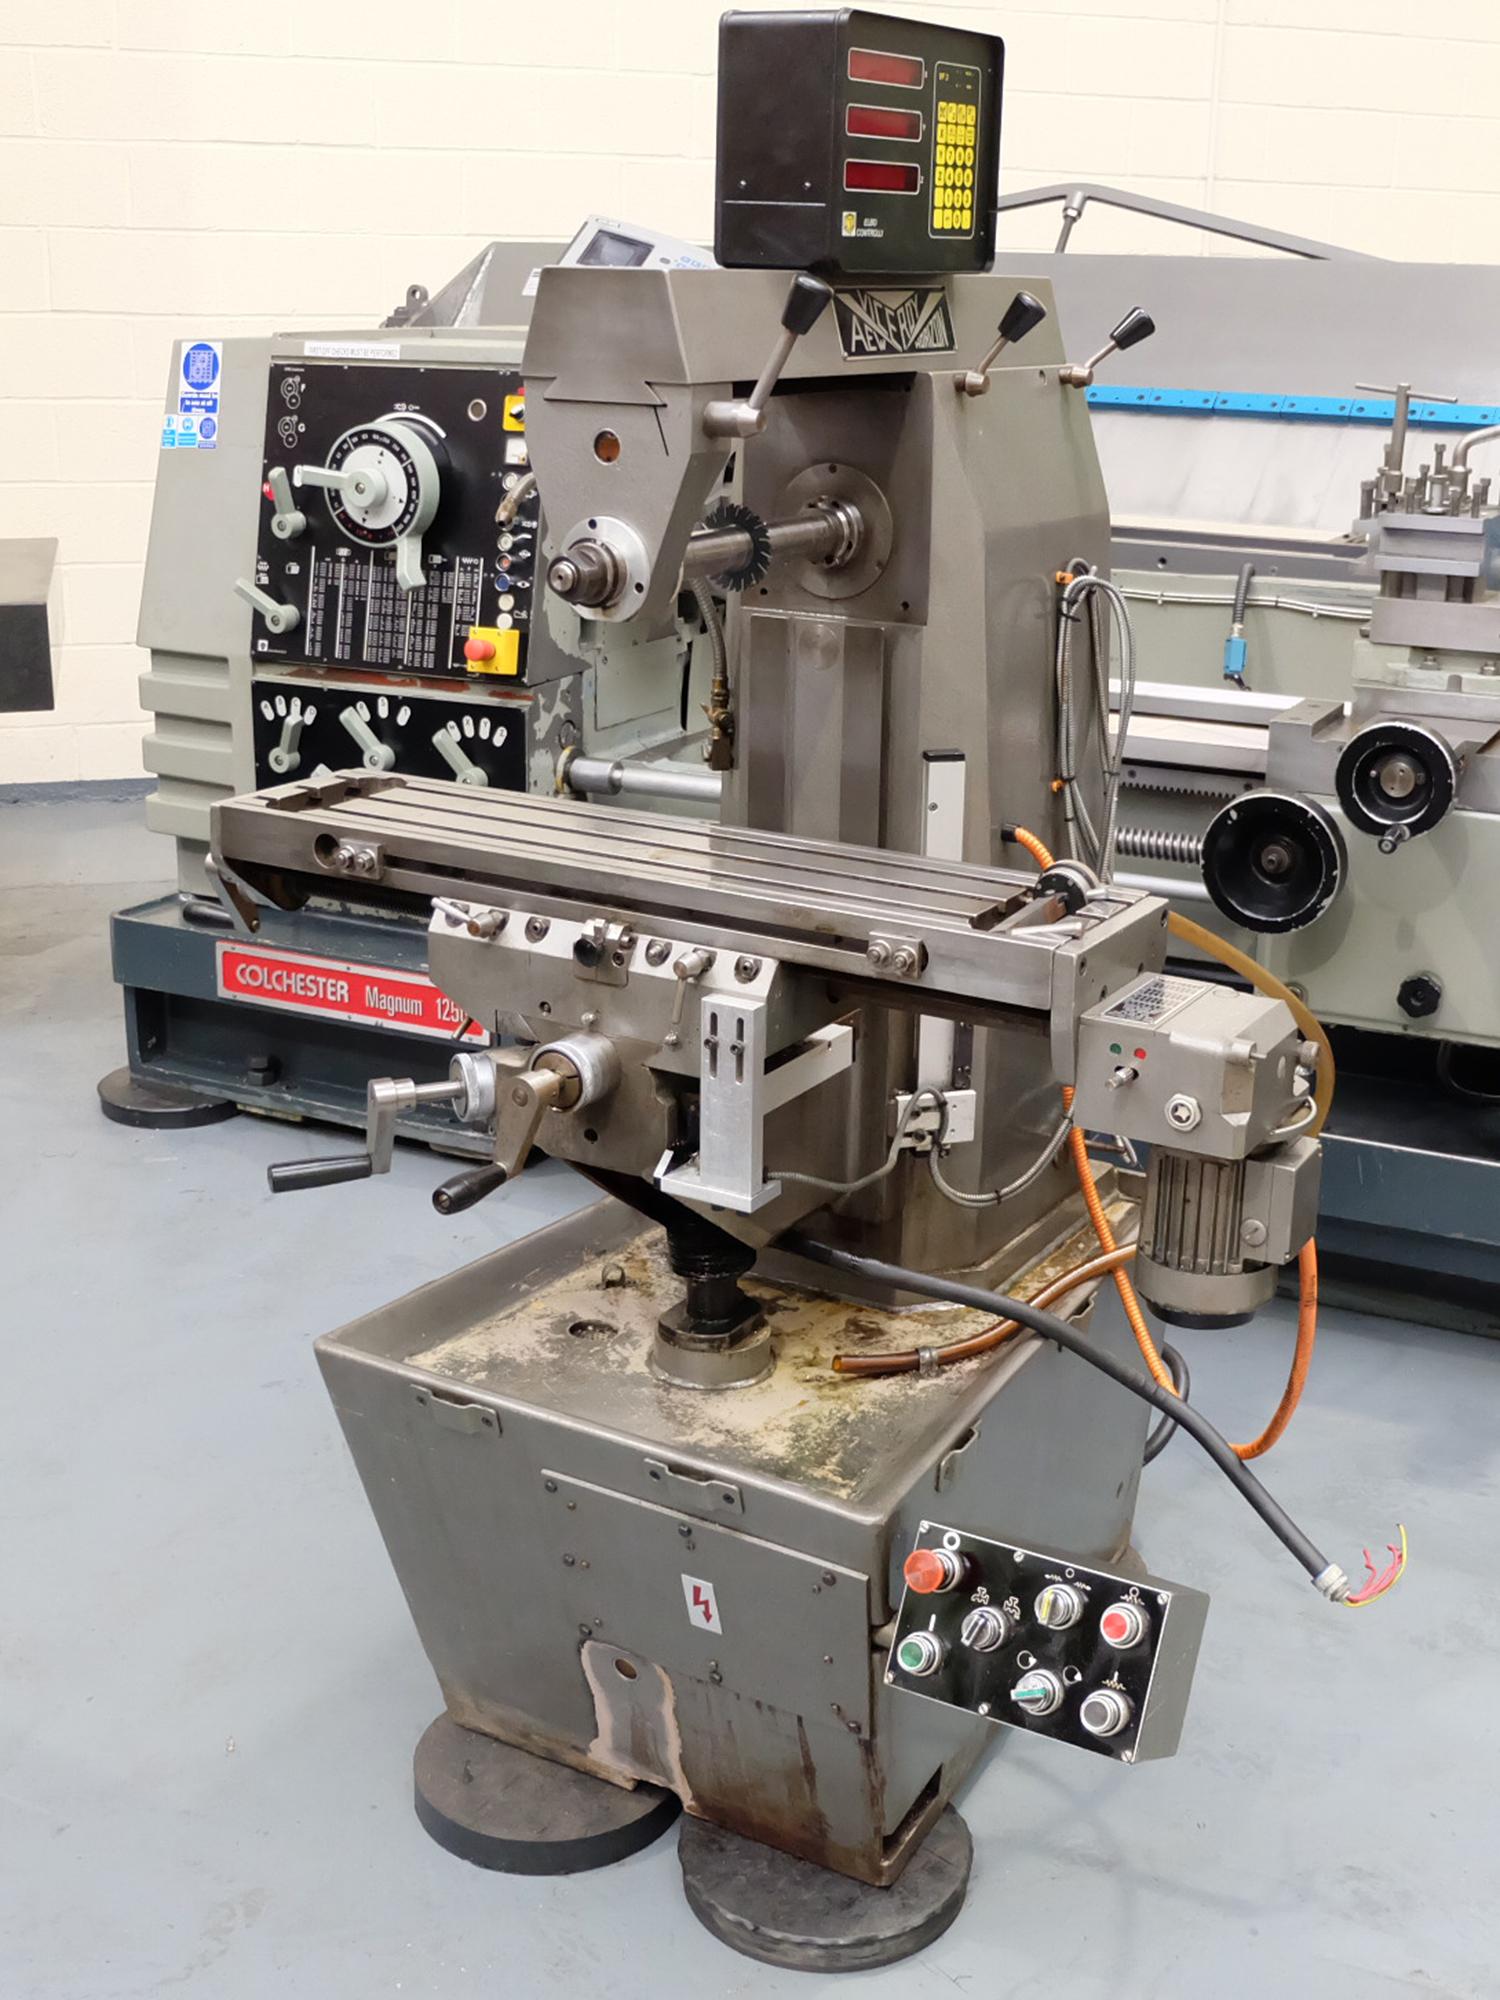 Veceroy AEW: Horizontal Milling Machine.